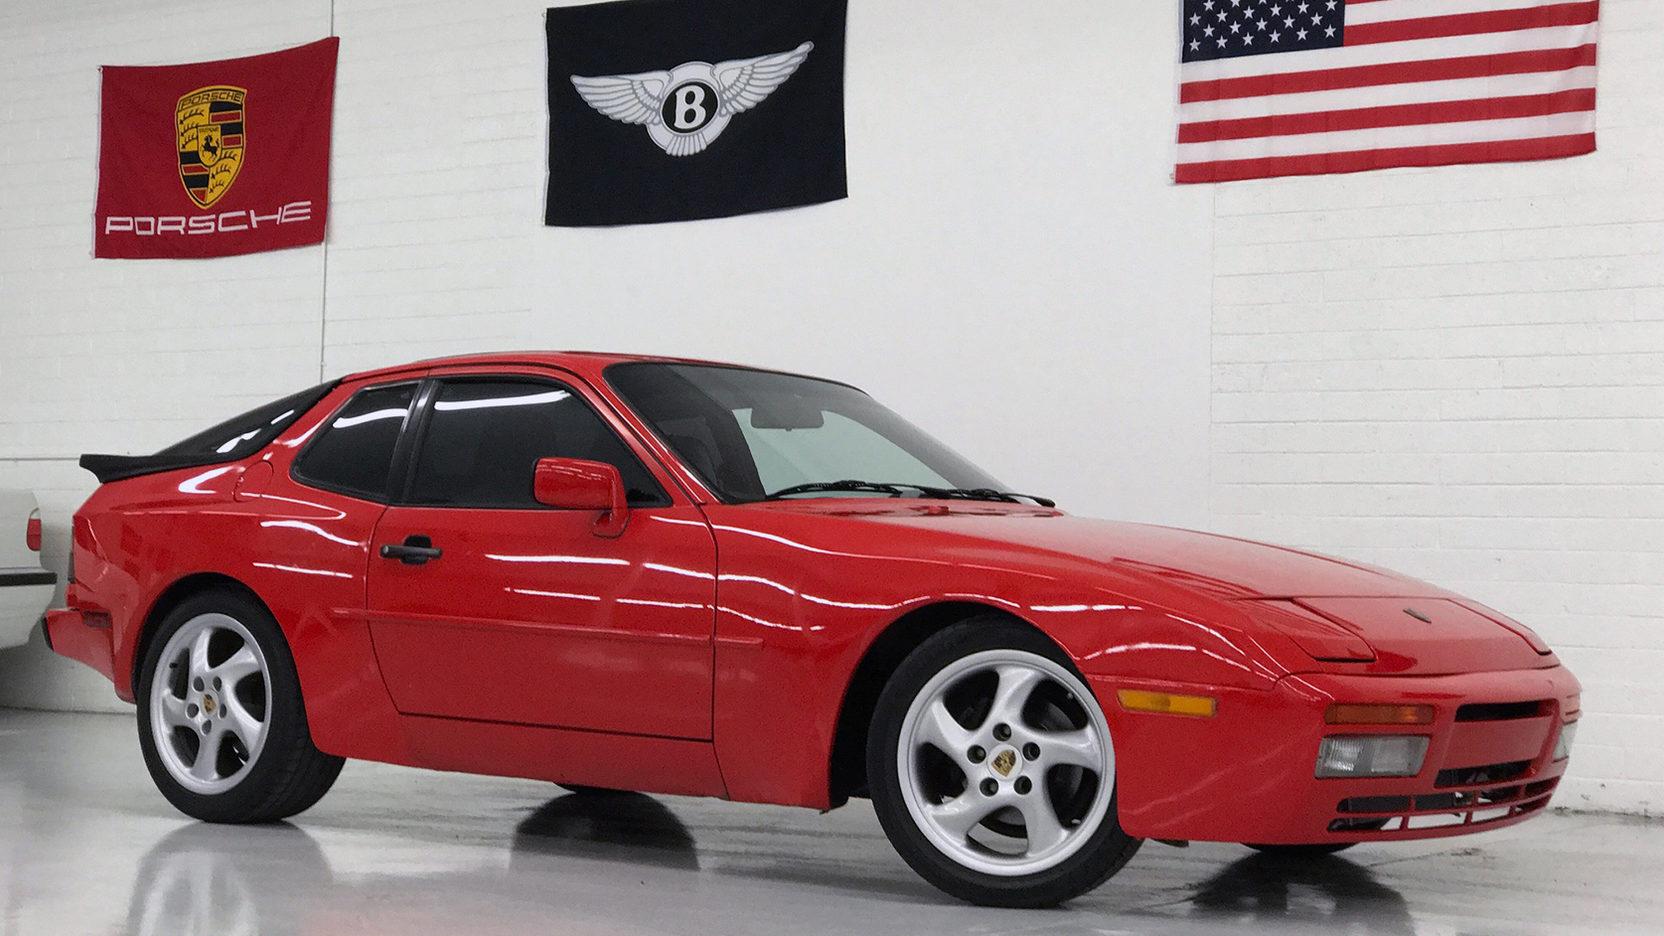 1986 Porsche 944 Turbo front 3/4 red